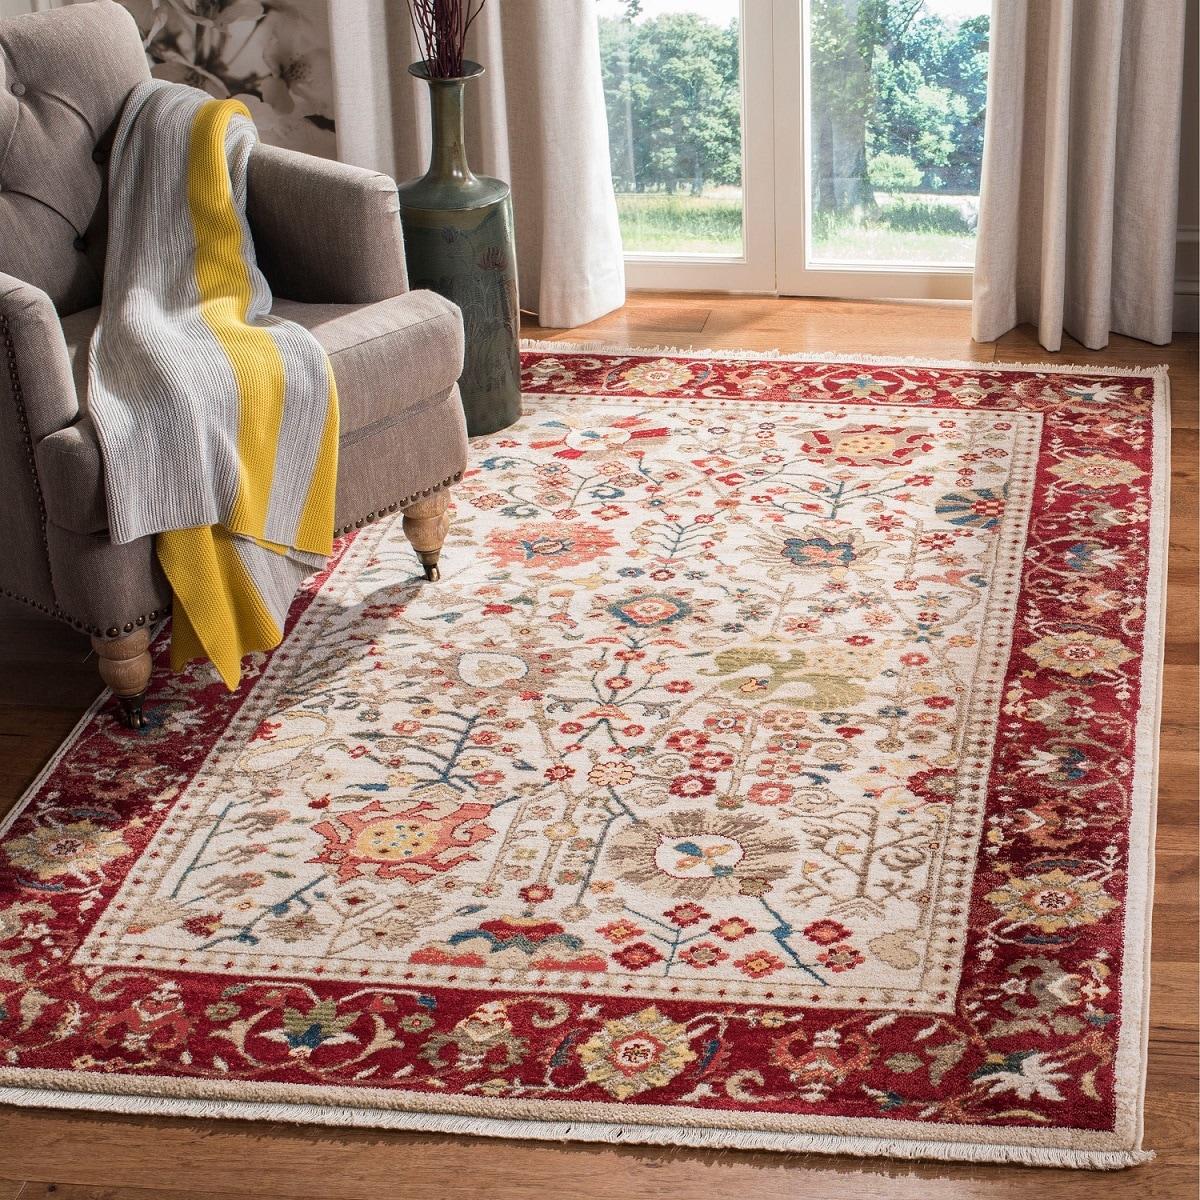 Oriental rug for living room   Source: overstock.com